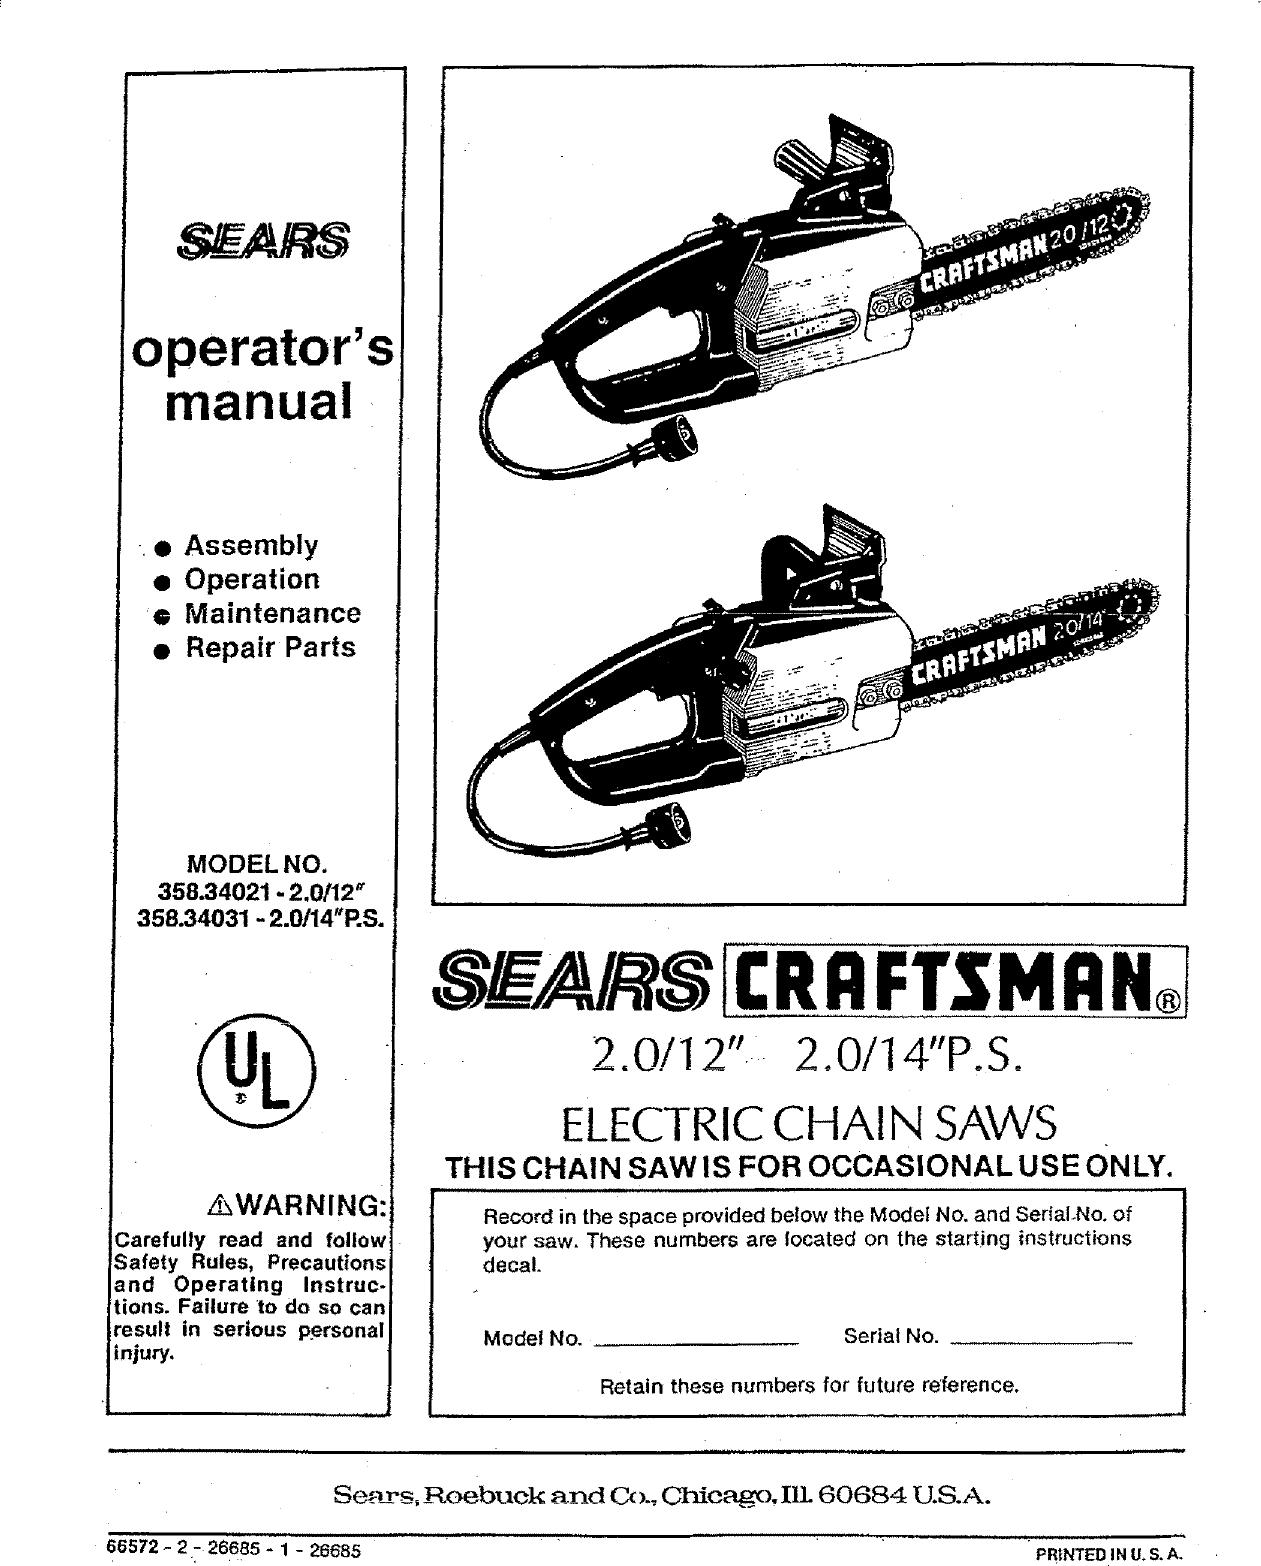 Craftsman 35834021 User Manual ELECTRIC CHAIN SAWS Manuals